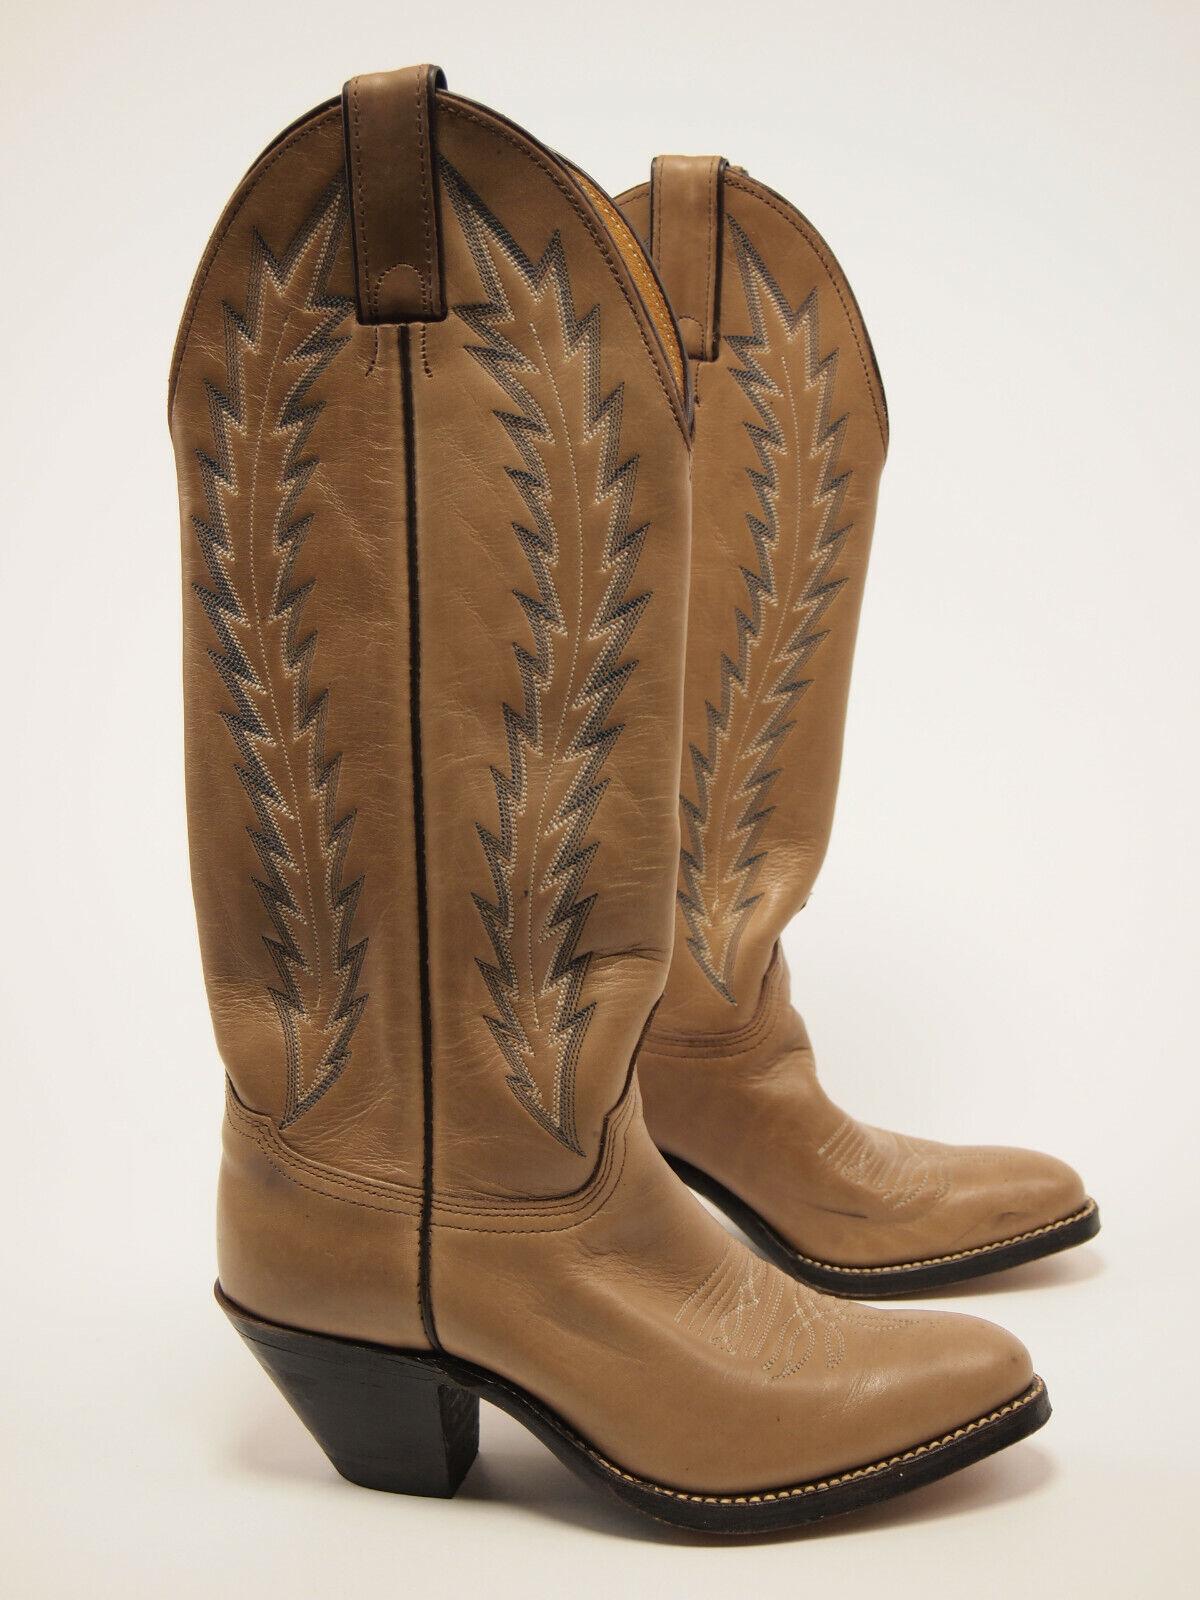 ABILENE Vintage 80s Tall Mocha Western Cowgirl Boots 5